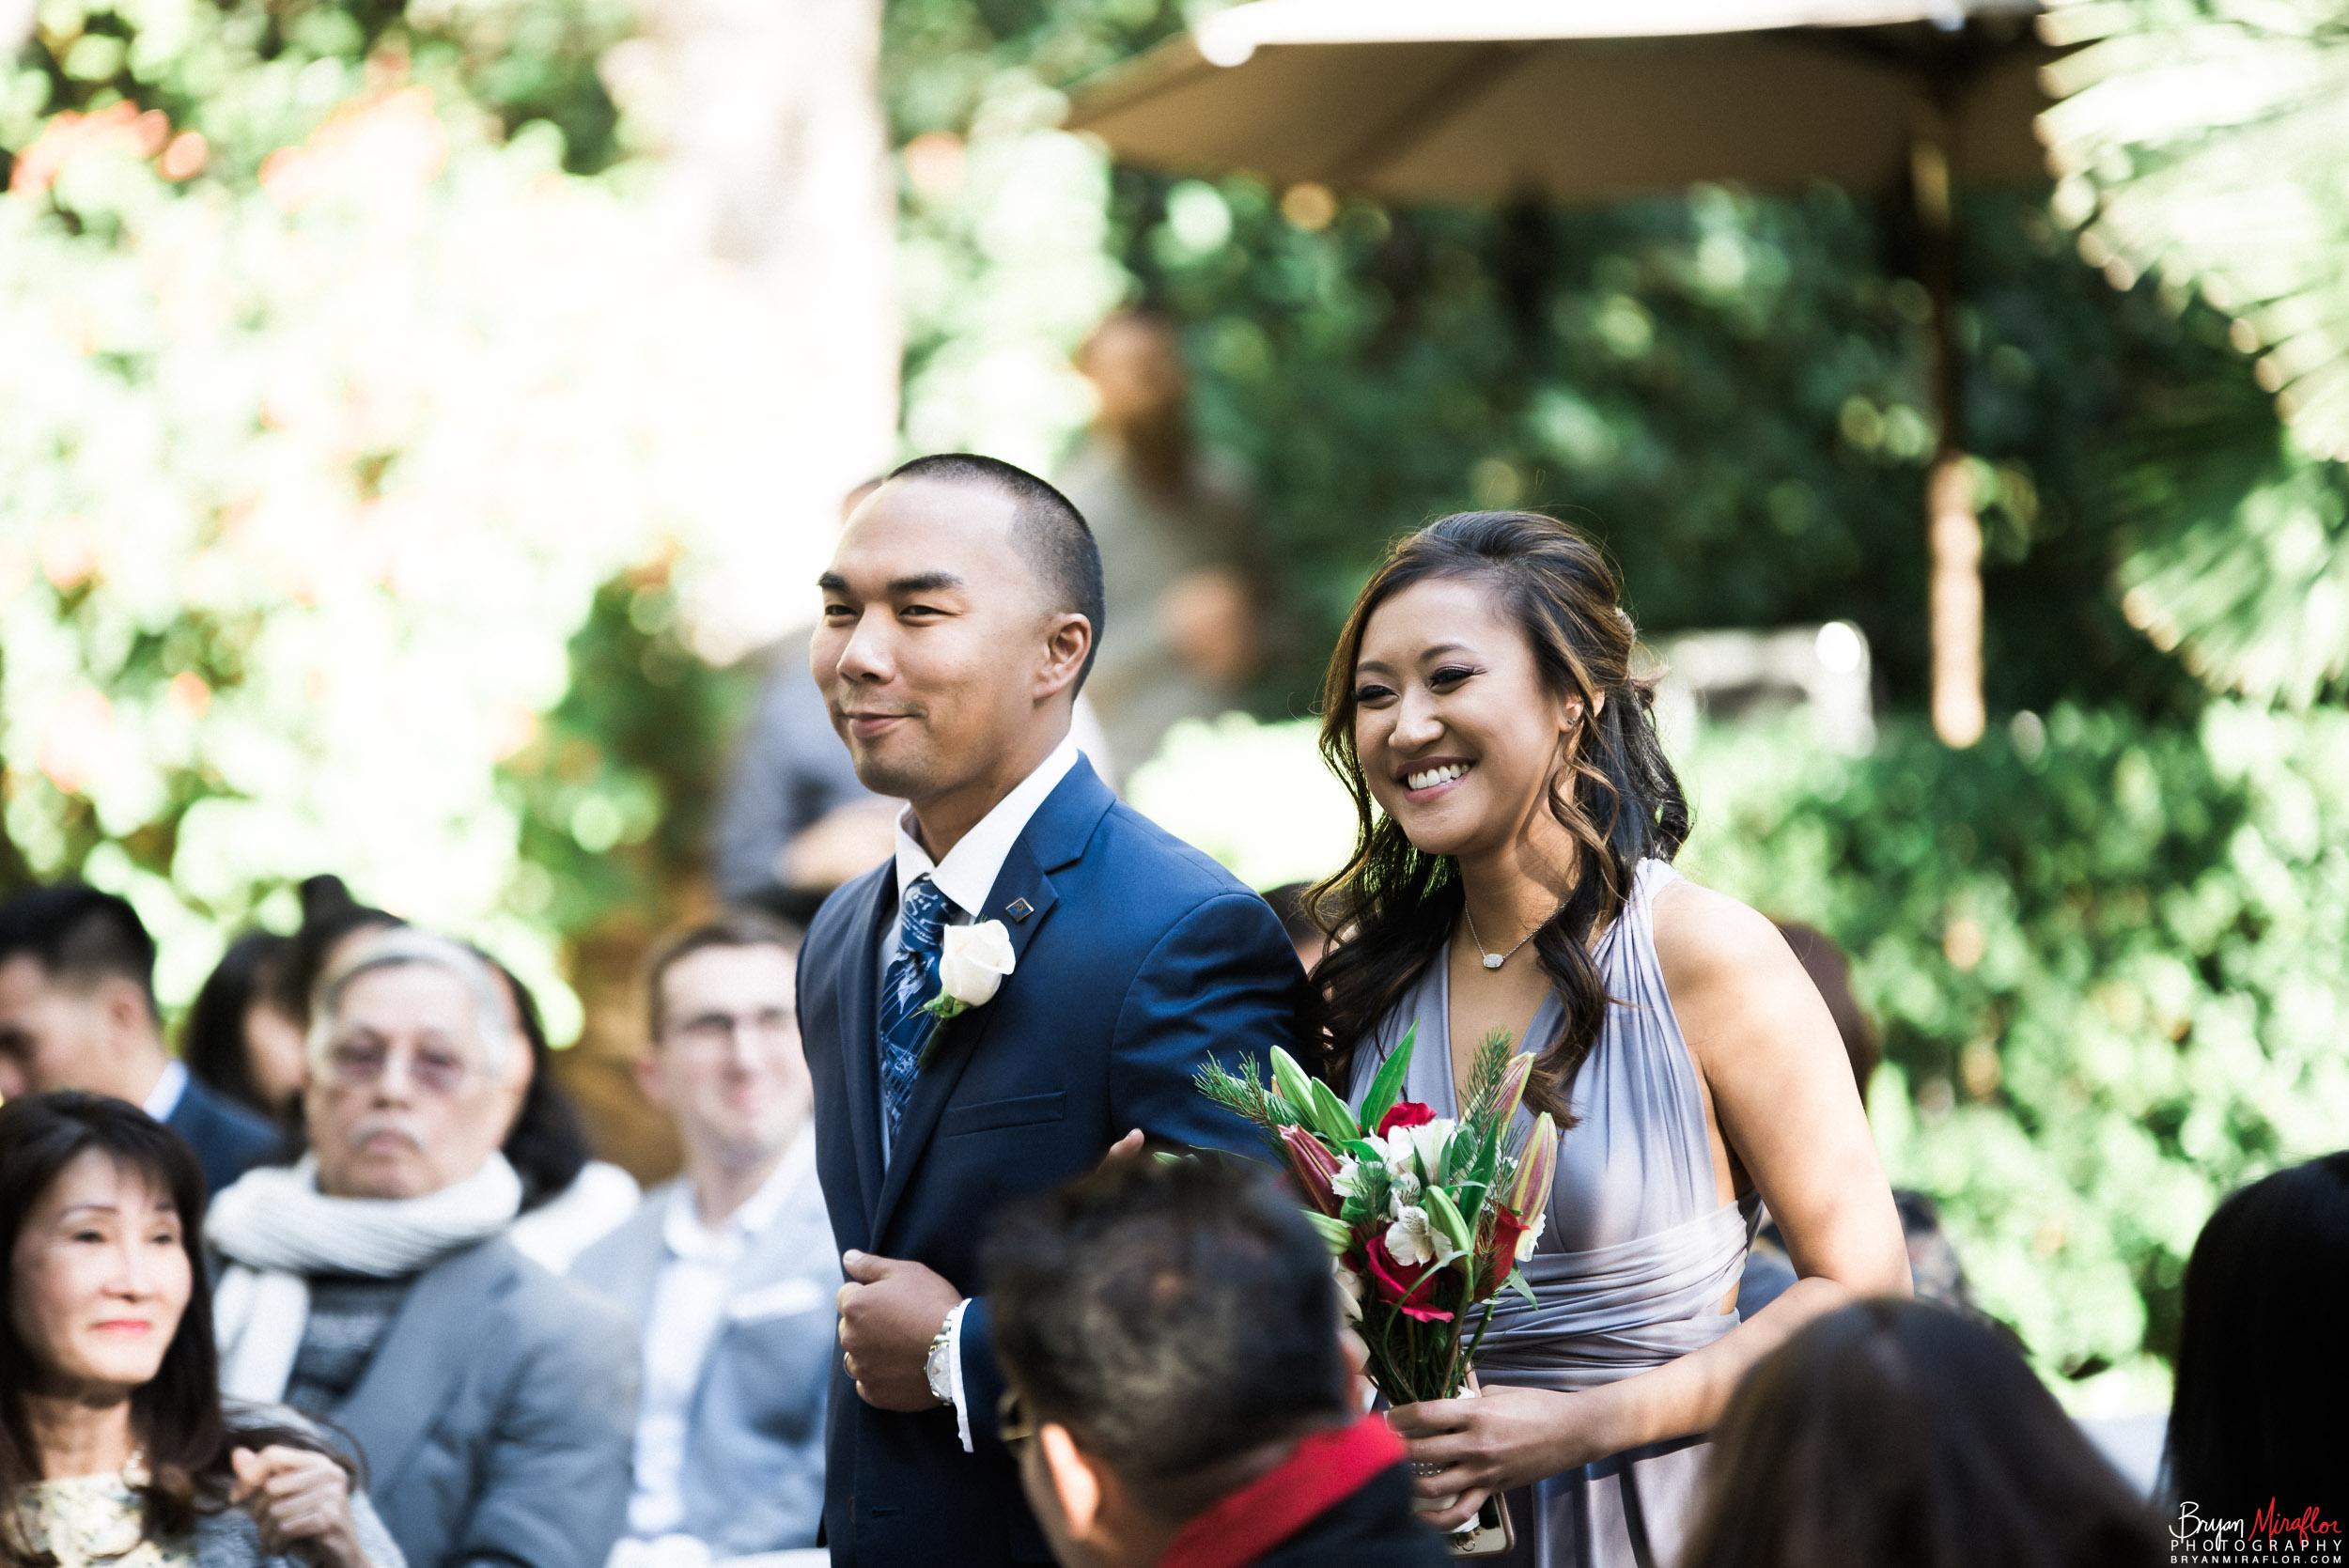 Bryan-Miraflor-Photography-Hannah-Jonathan-Married-Grand-Traditions-Estate-Gardens-Fallbrook-20171222-086.jpg